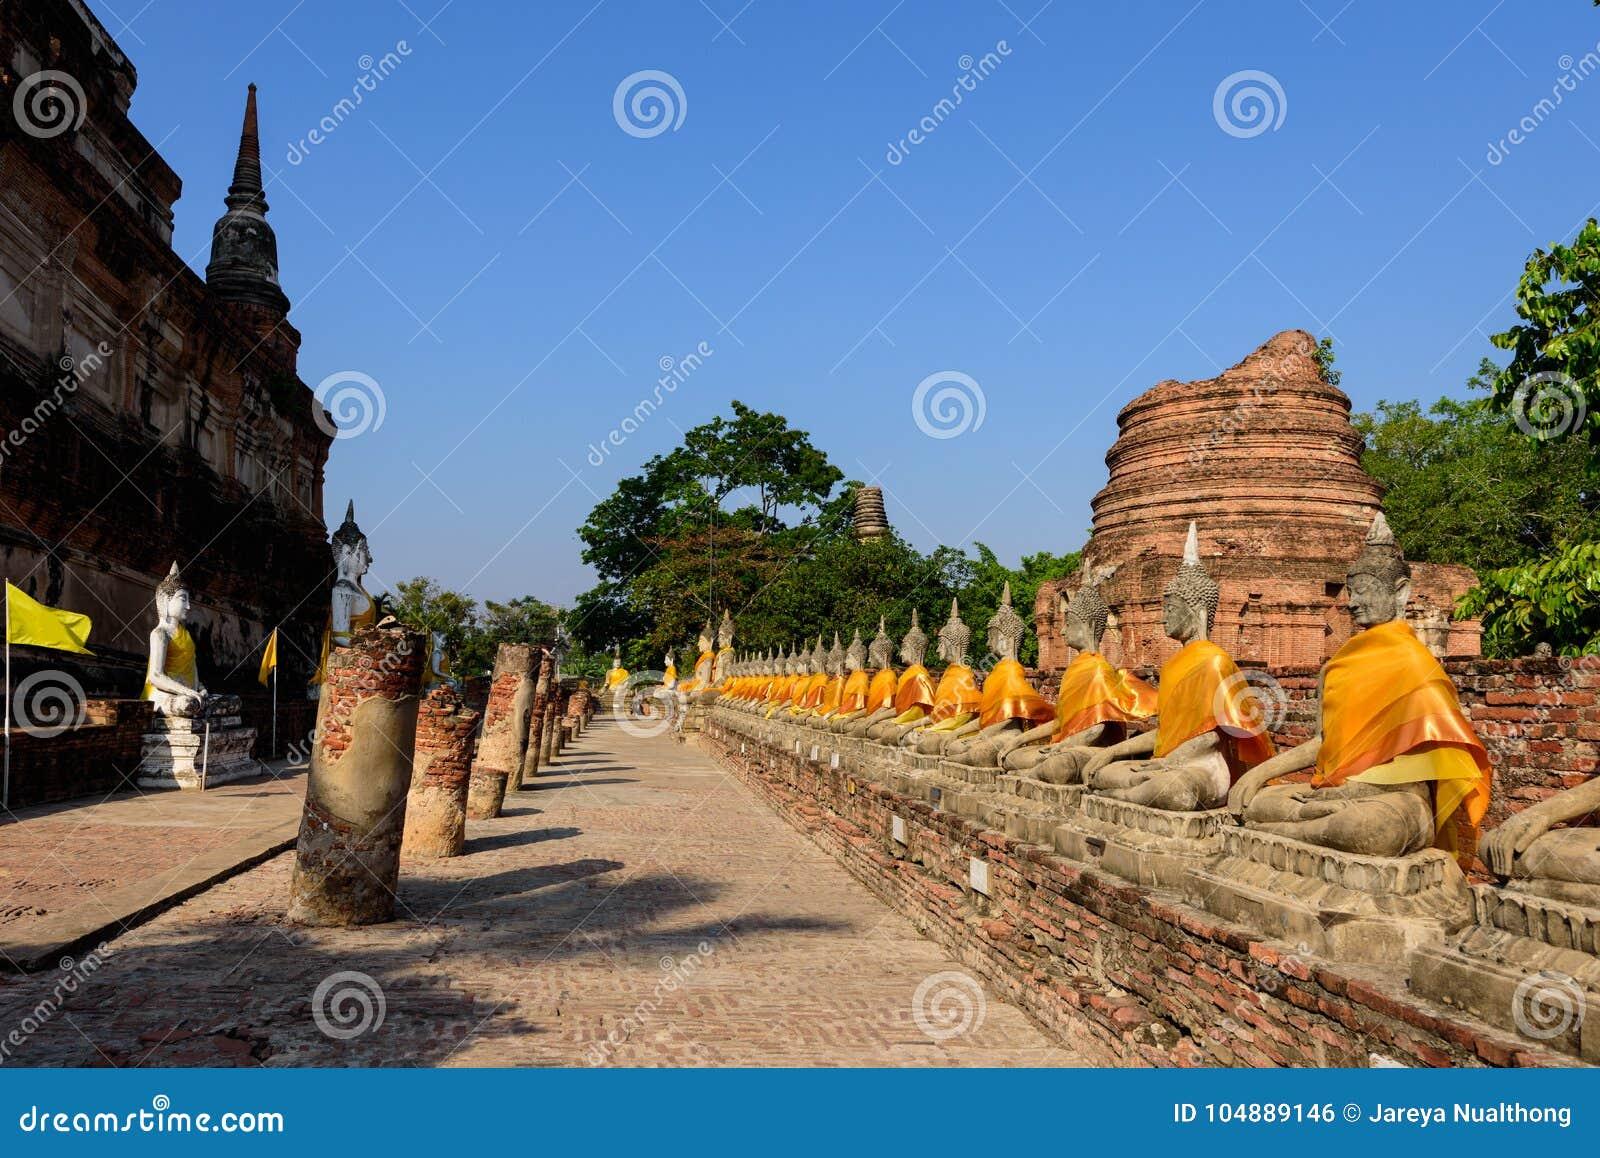 Den breda vinkeln av Buddha avbildar Wat Yai Chai Mongkon i Ayutthaya